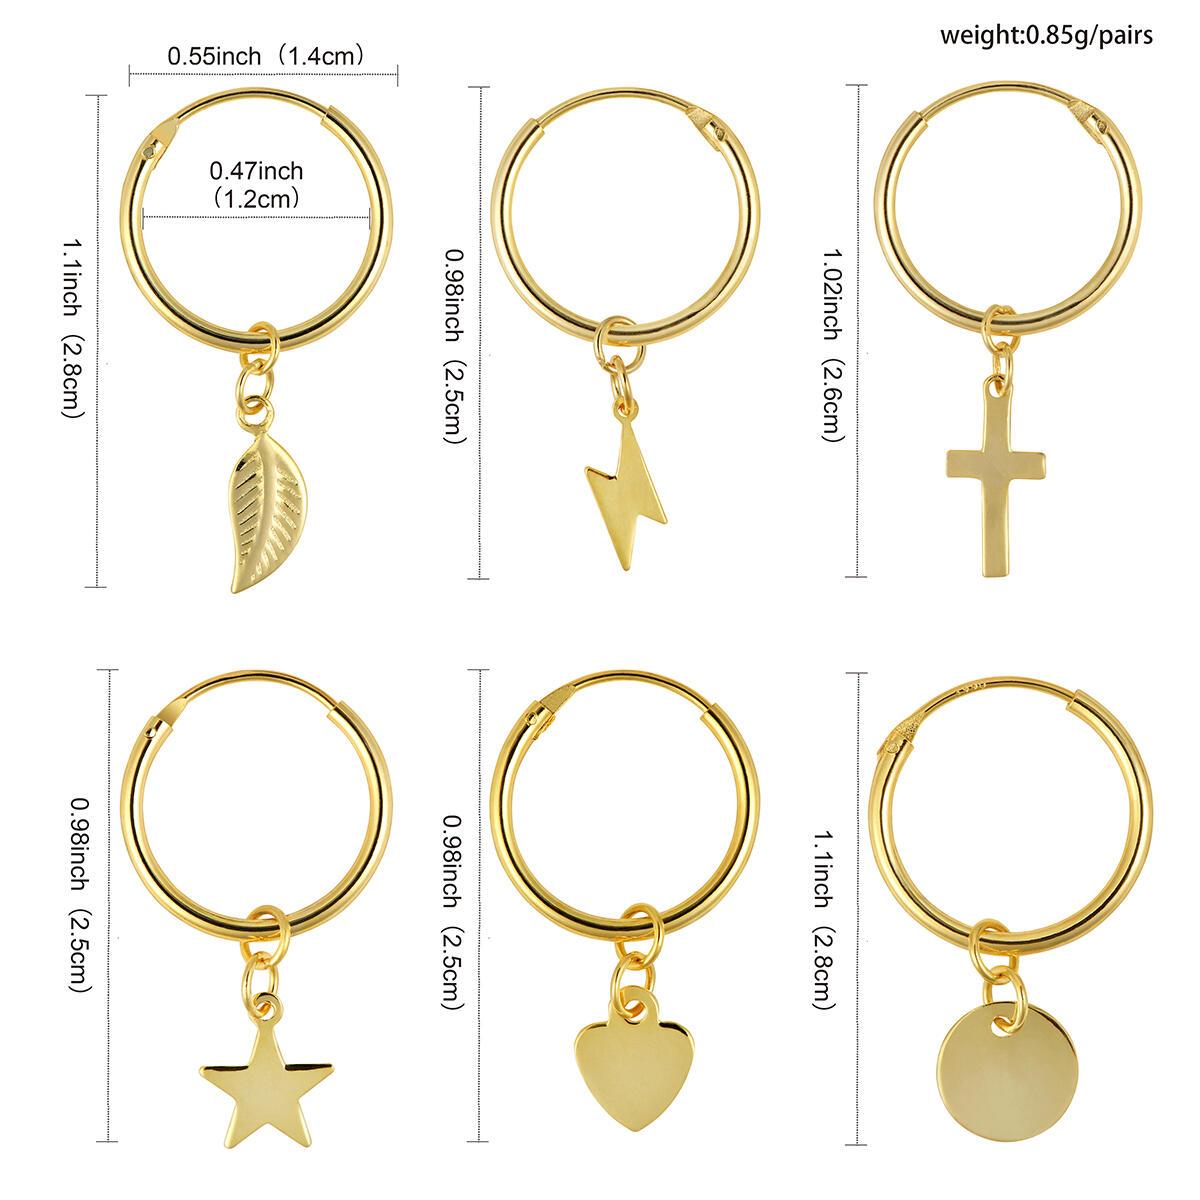 YeGieonr Small Dangle Hoop Earrings -Cross Hoop Earrings -925 Sterling Silver with 14k Gold Plated,Minimalist Dainty Huggie Hoop Earrings with Tiny Charms For Women/girls/teens